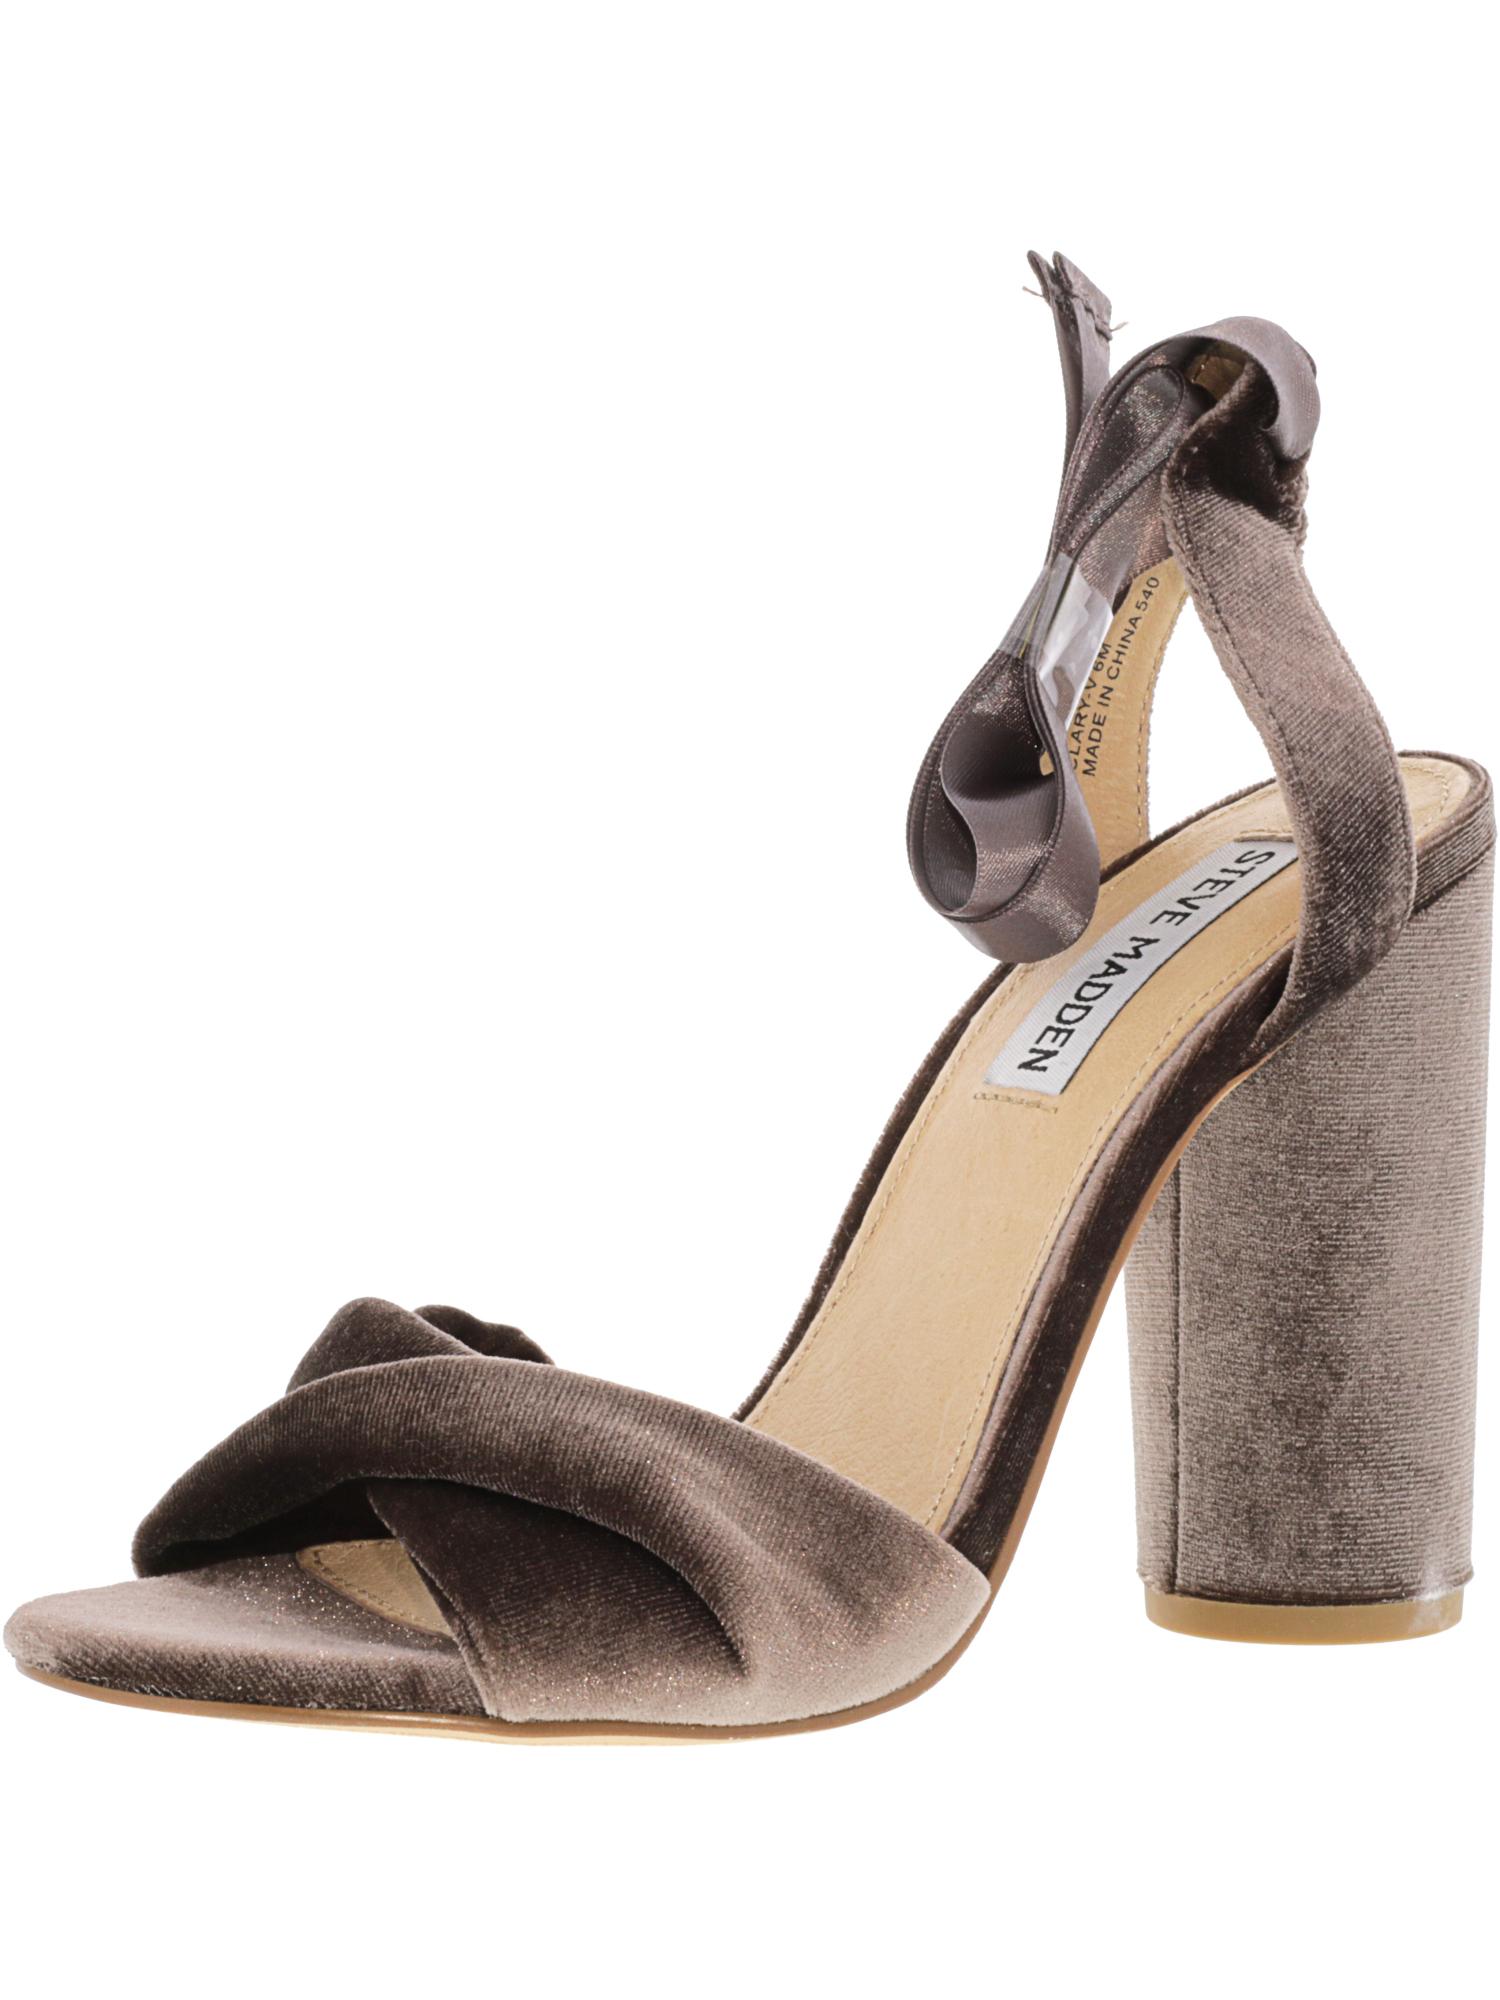 5787d9dfdc8 Steve Madden Women s Clary-V Ankle-High Fabric Pump